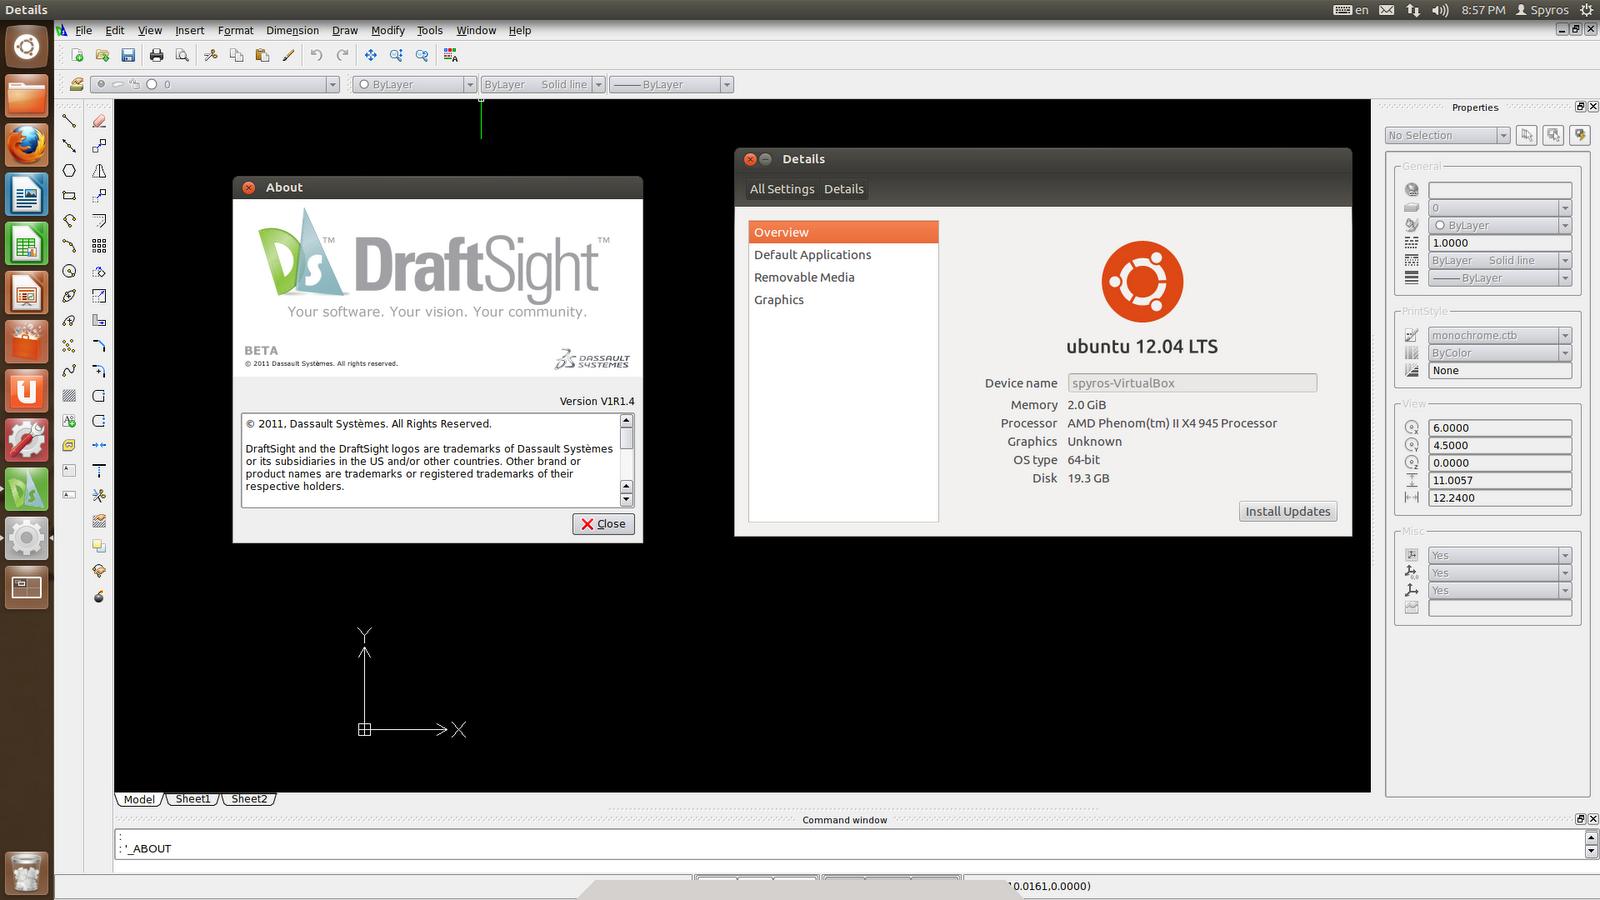 draftsight activation code crack